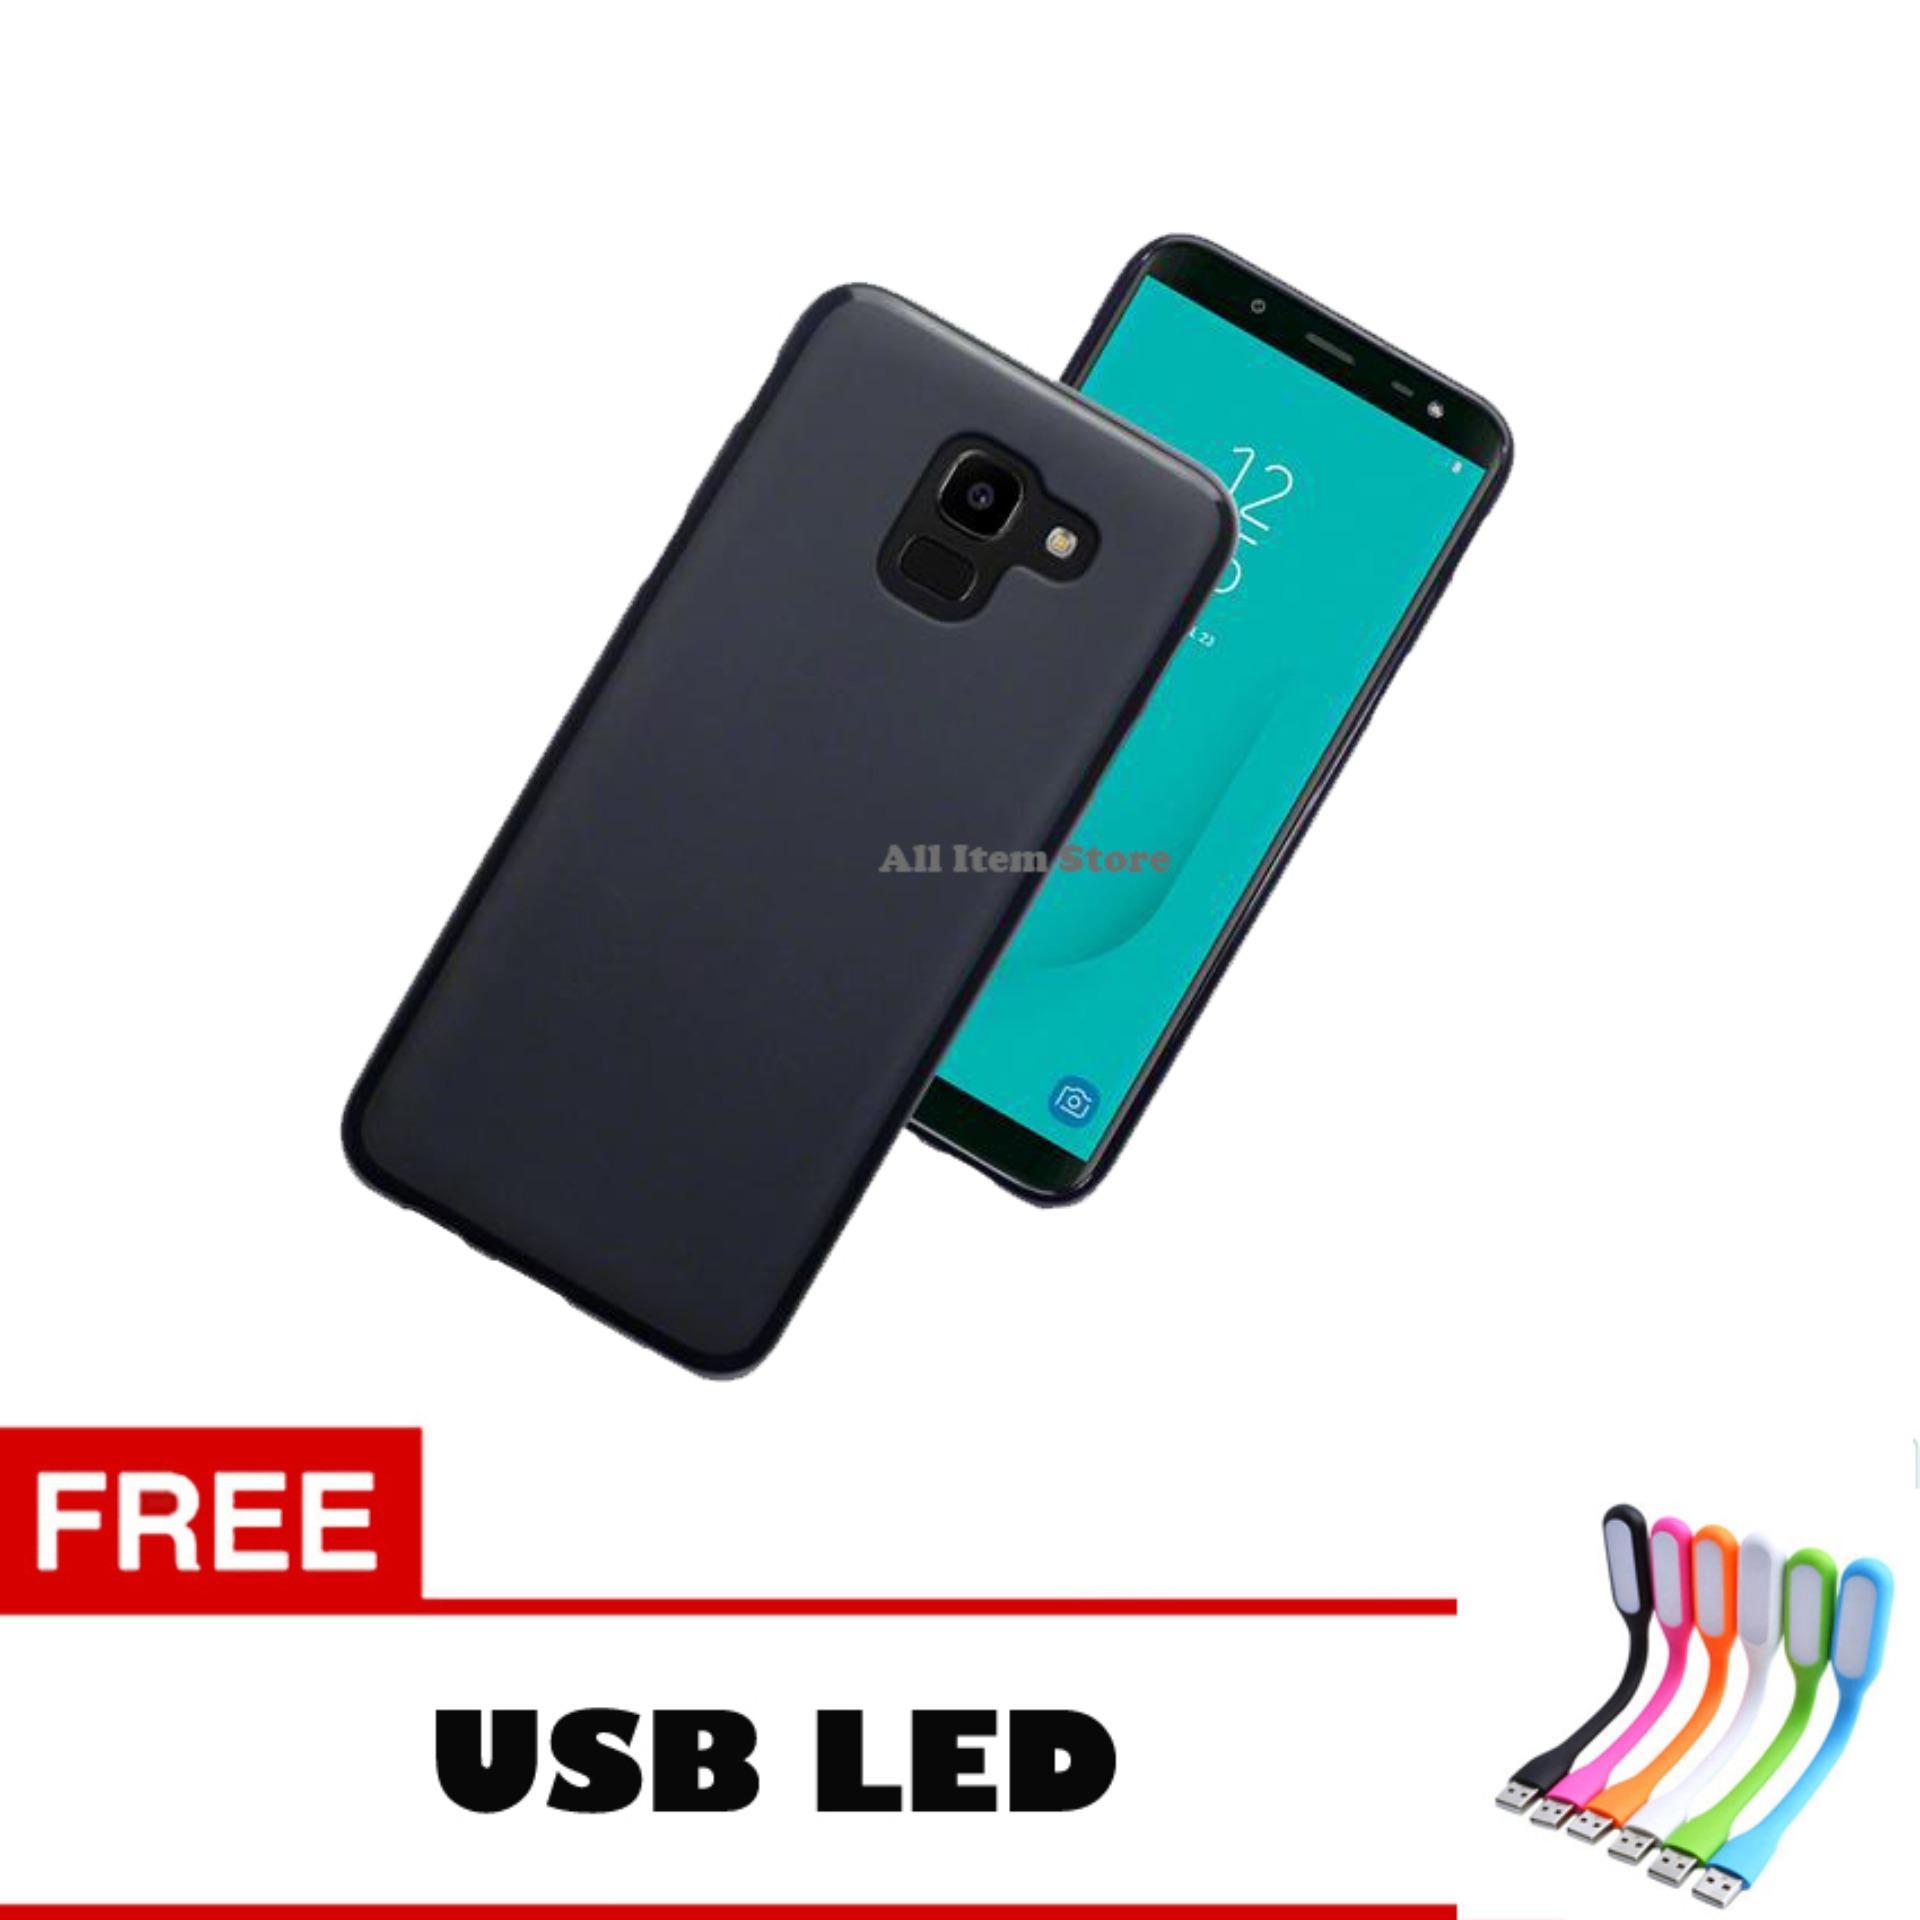 Case Slim Black Matte Samsung Galaxy J6 Baby Skin Softcase Ultra Thin Jelly Silikon Babyskin -